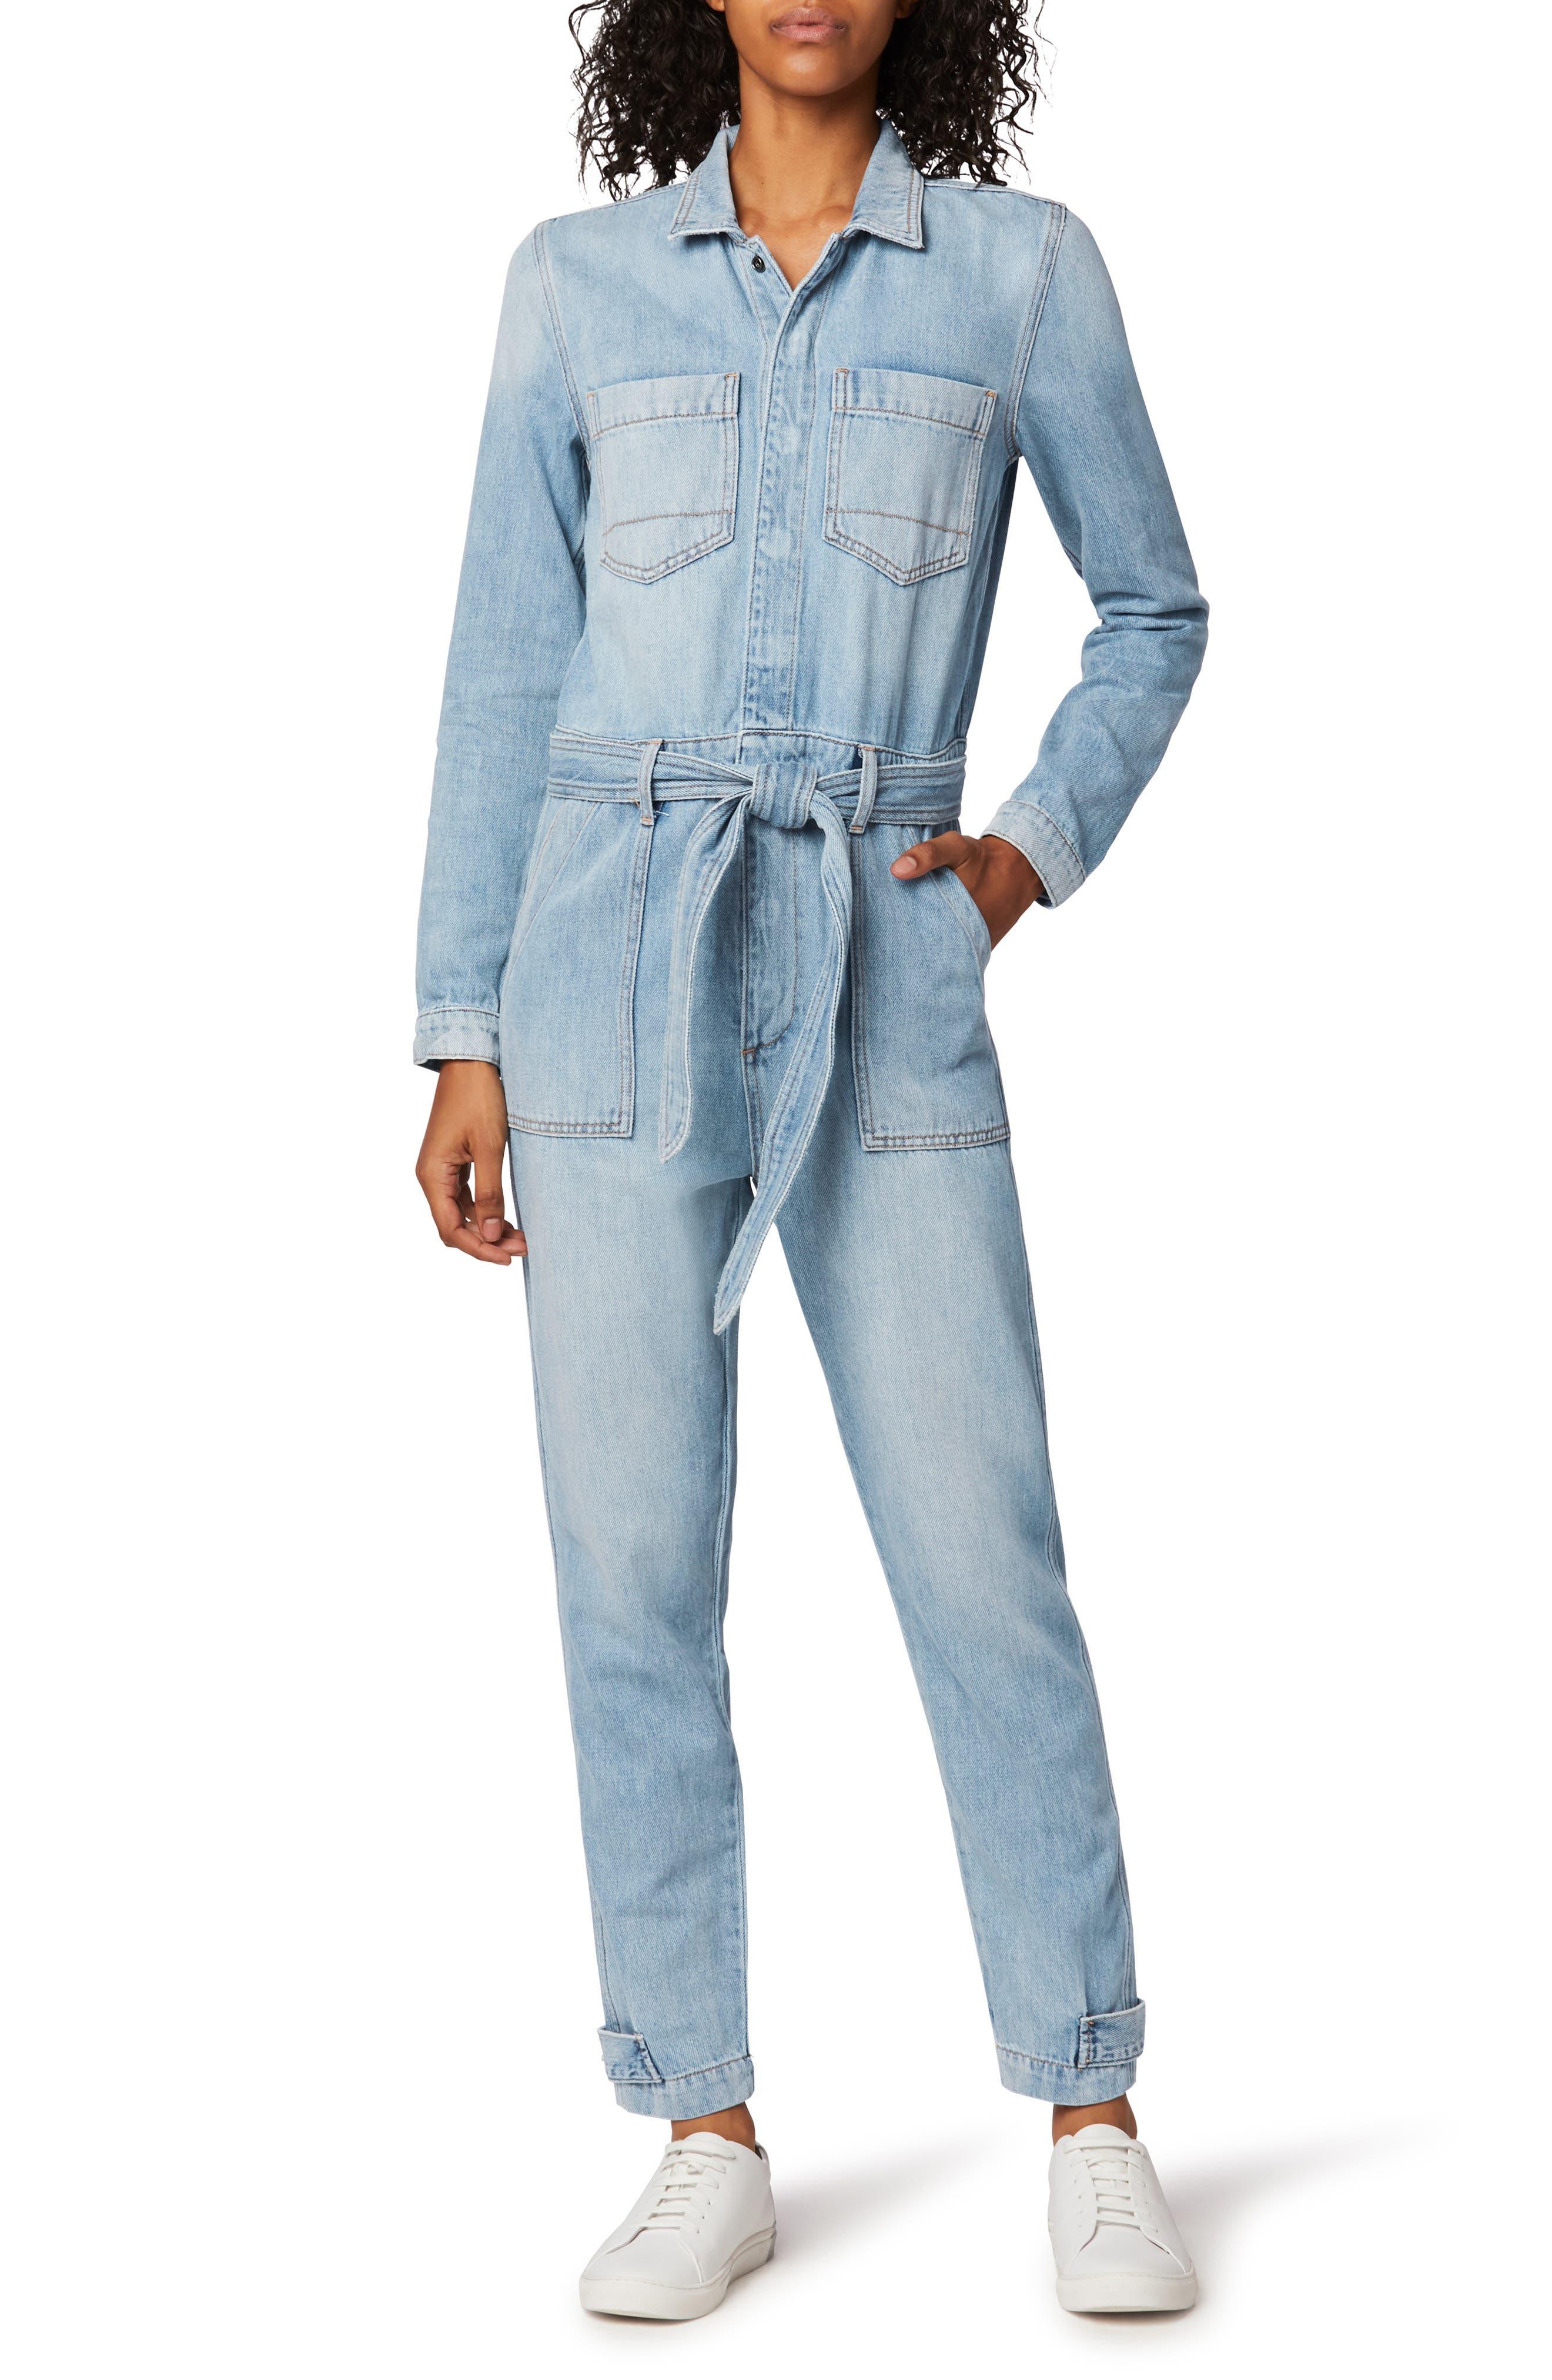 The Alexa Long Sleeve Denim Jumpsuit